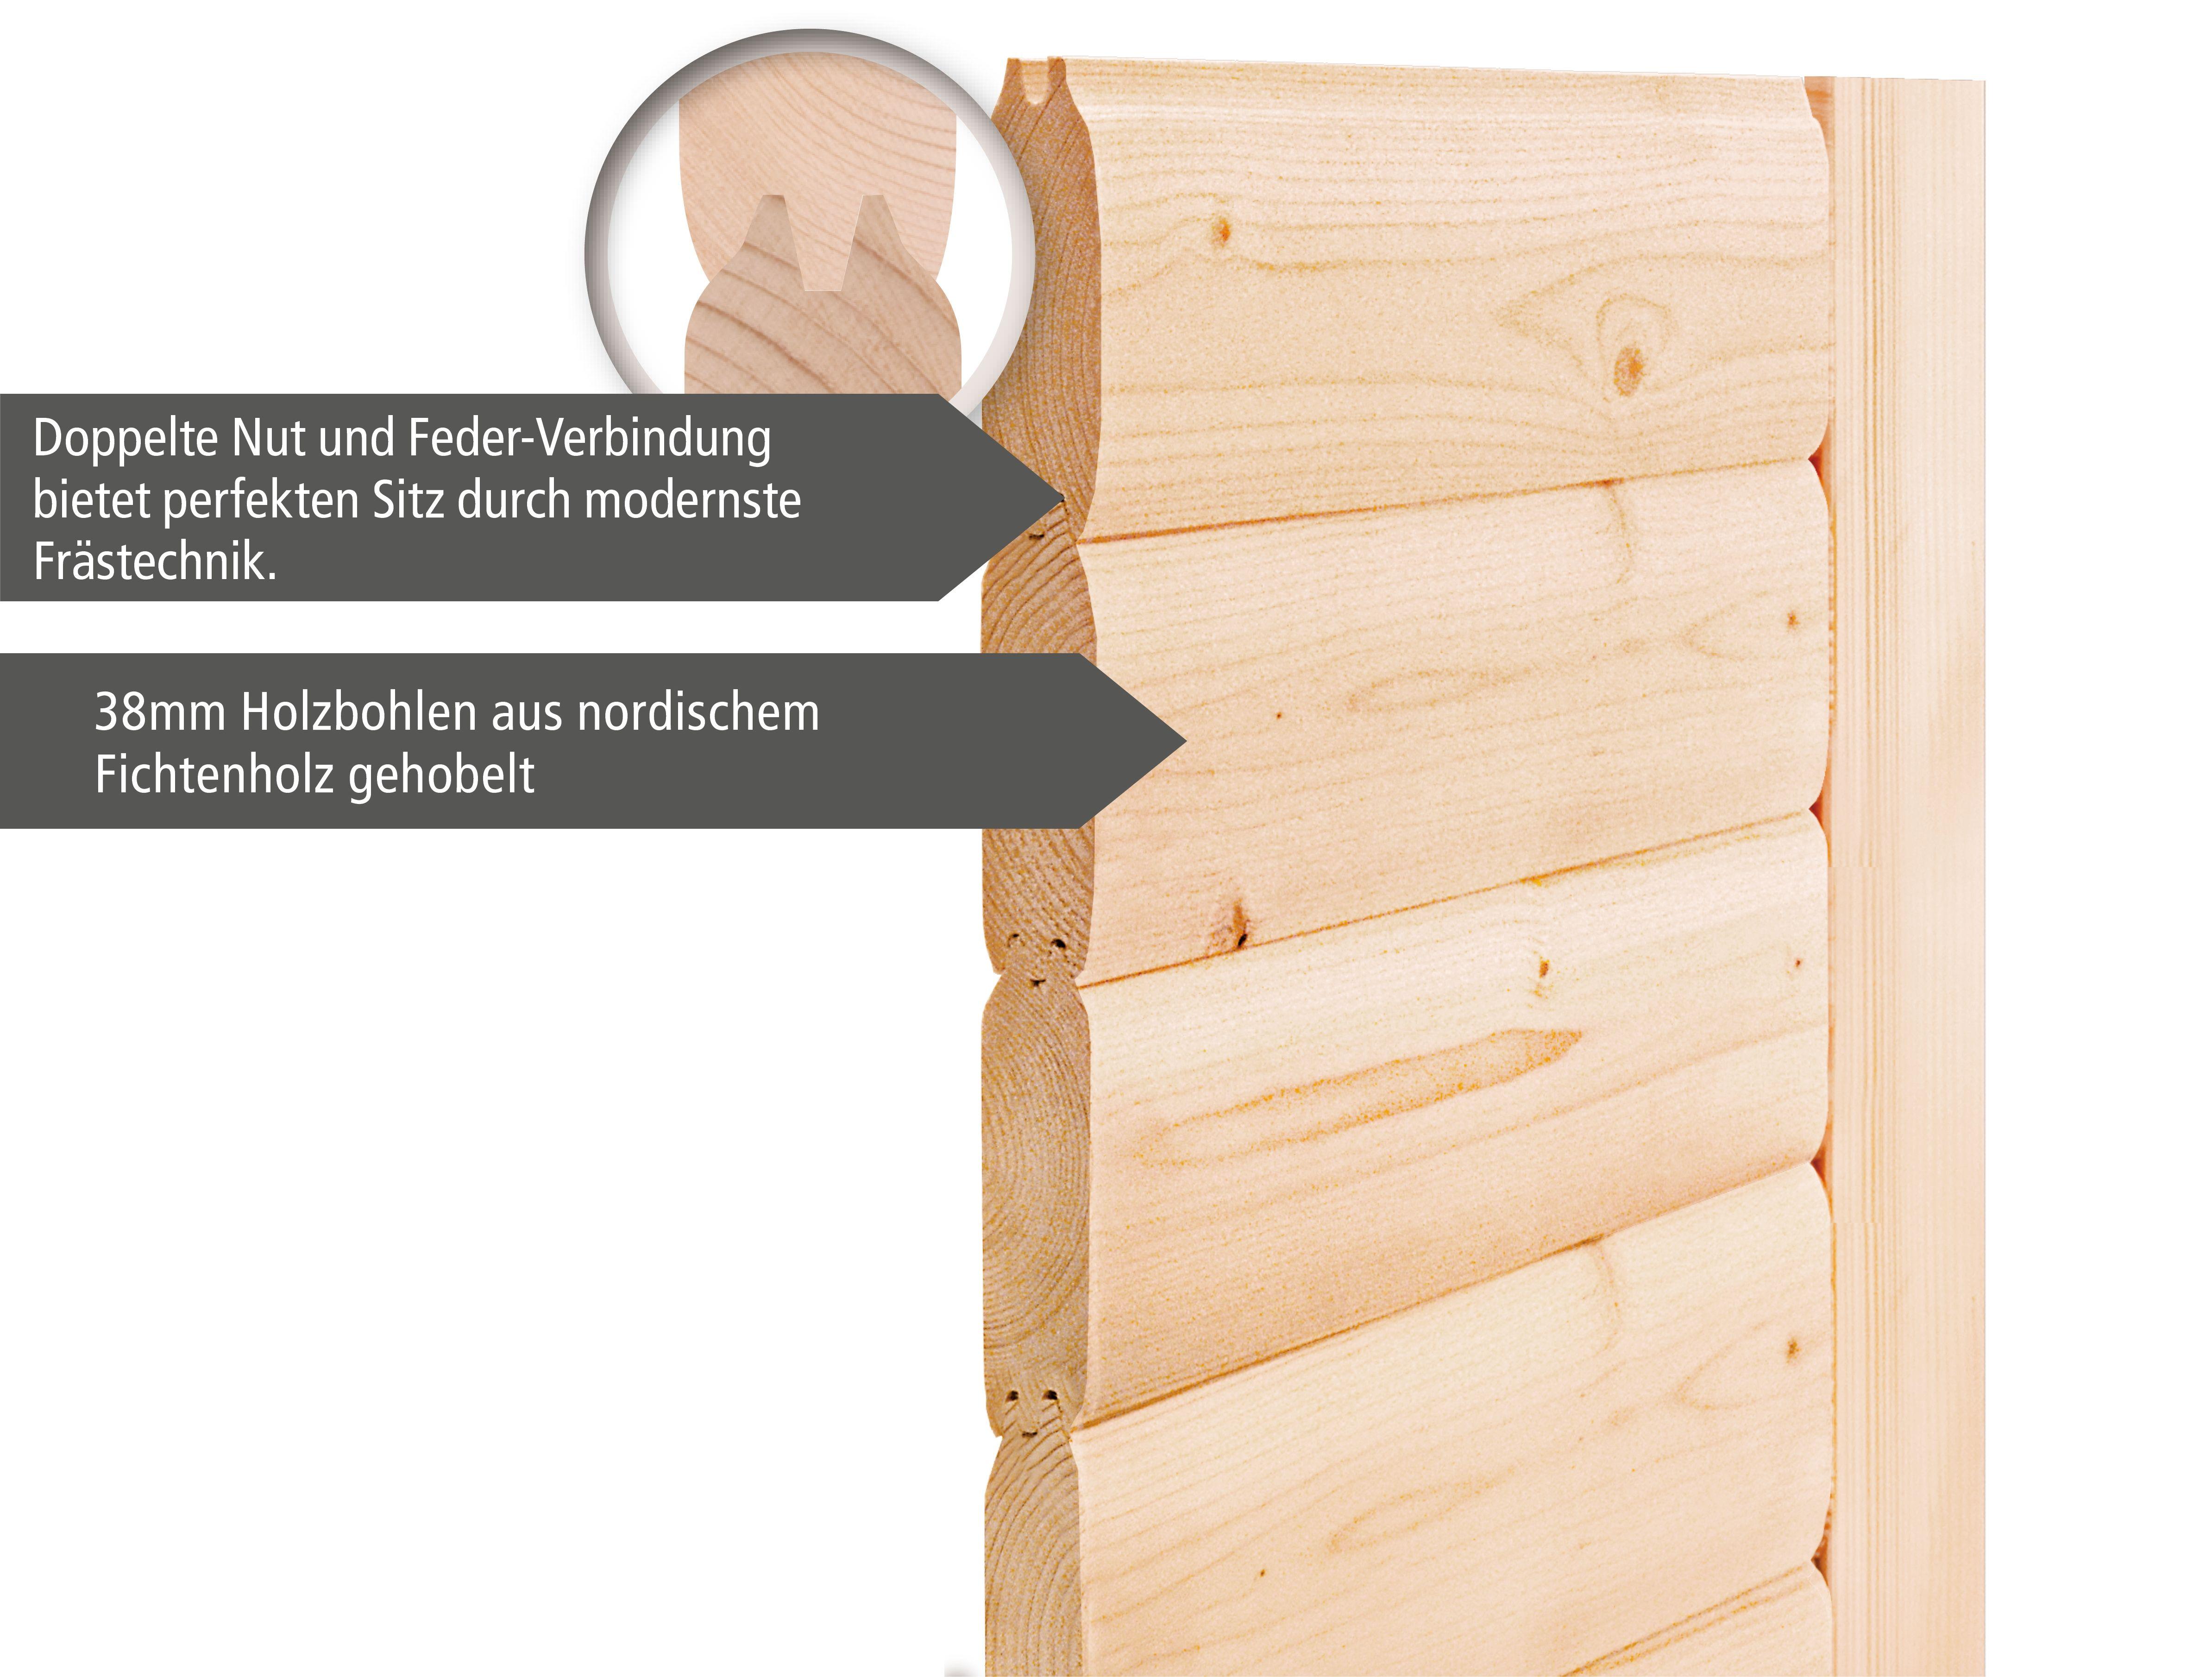 Woodfeeling Sauna Antonia 38mm 230V Bio Saunaofen 3,6 kW extern Bild 6